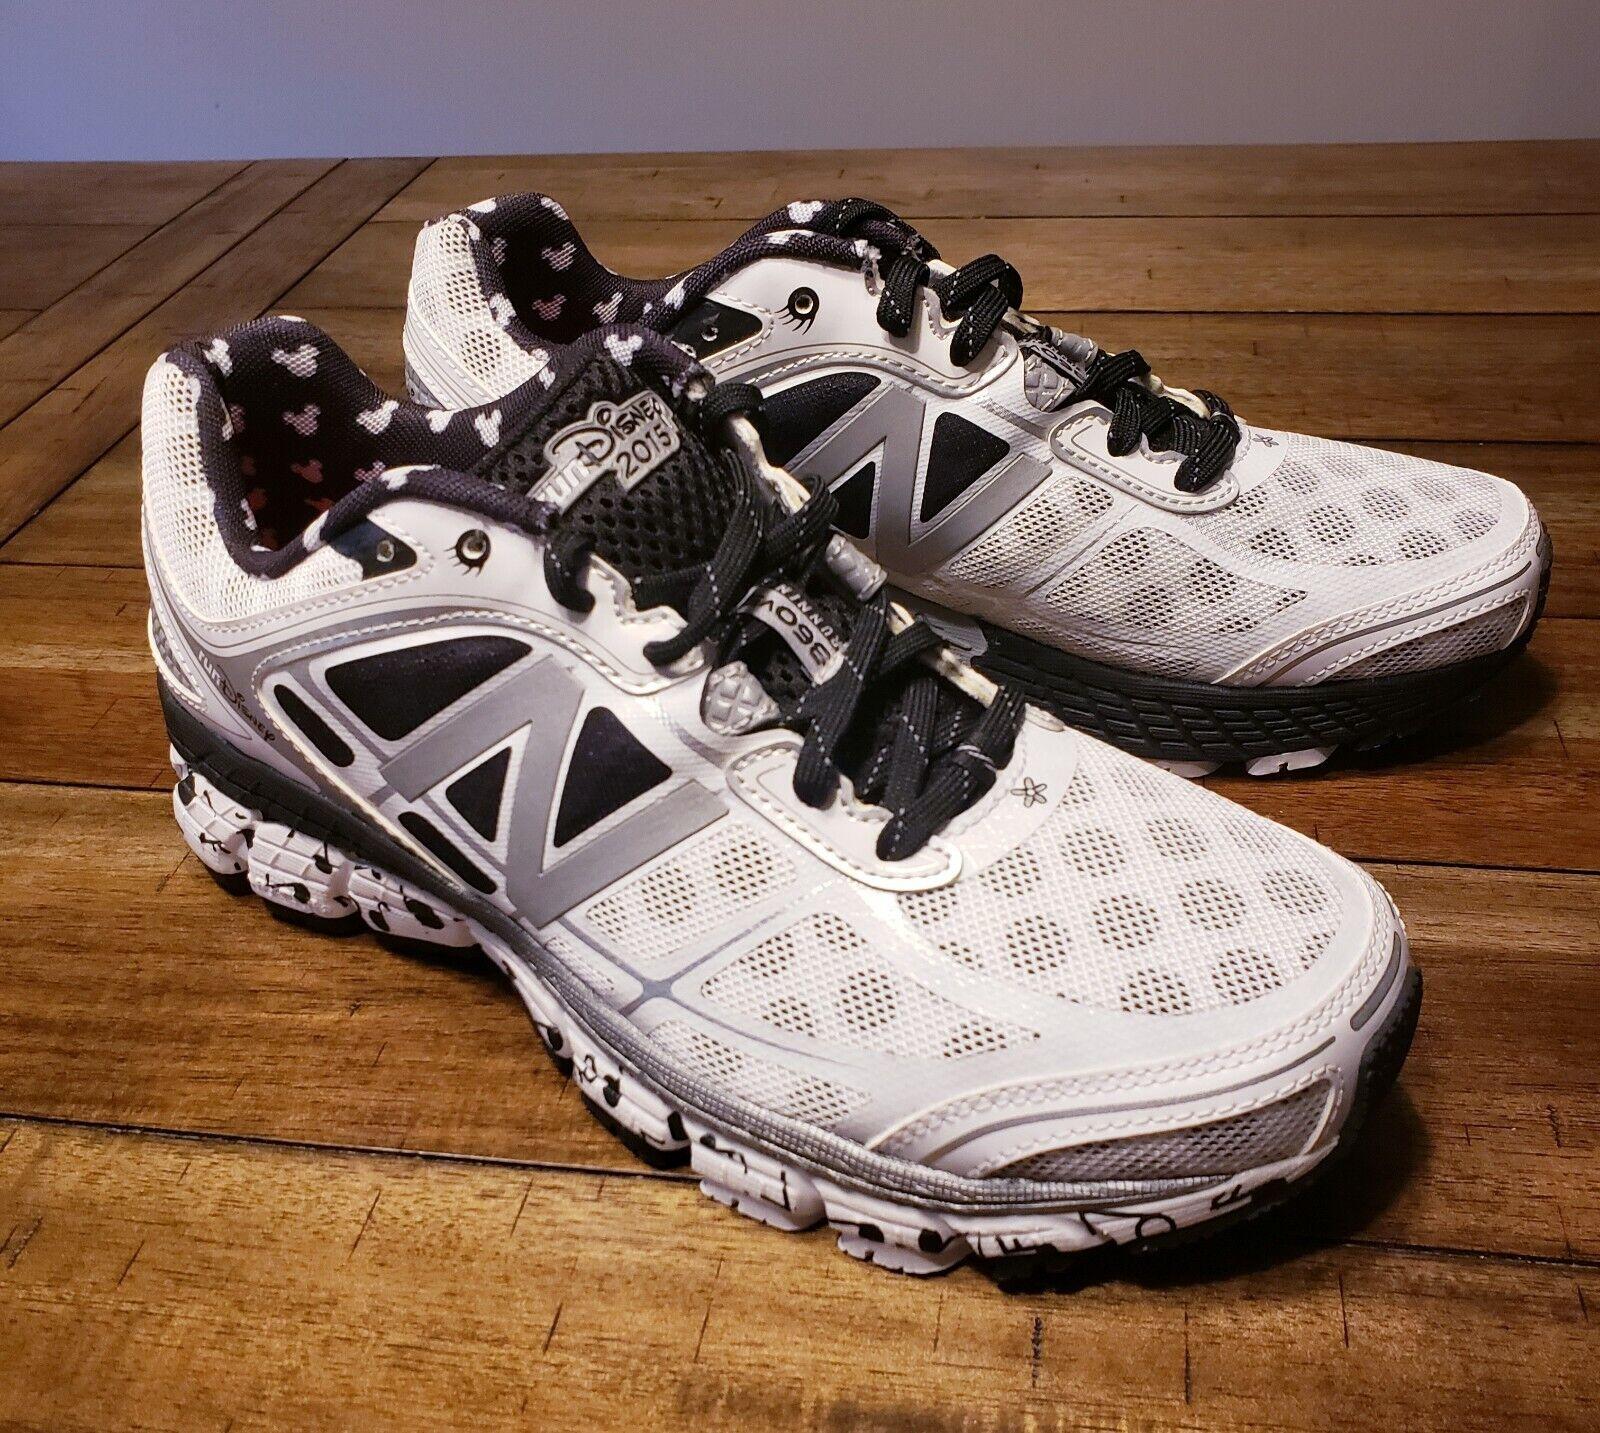 New balance 860 Nuevo Disney ejecutar Minnie Mouse 2015 2015 2015 zapatos talla 8 EE. UU. nuevo Sin Caja d70441